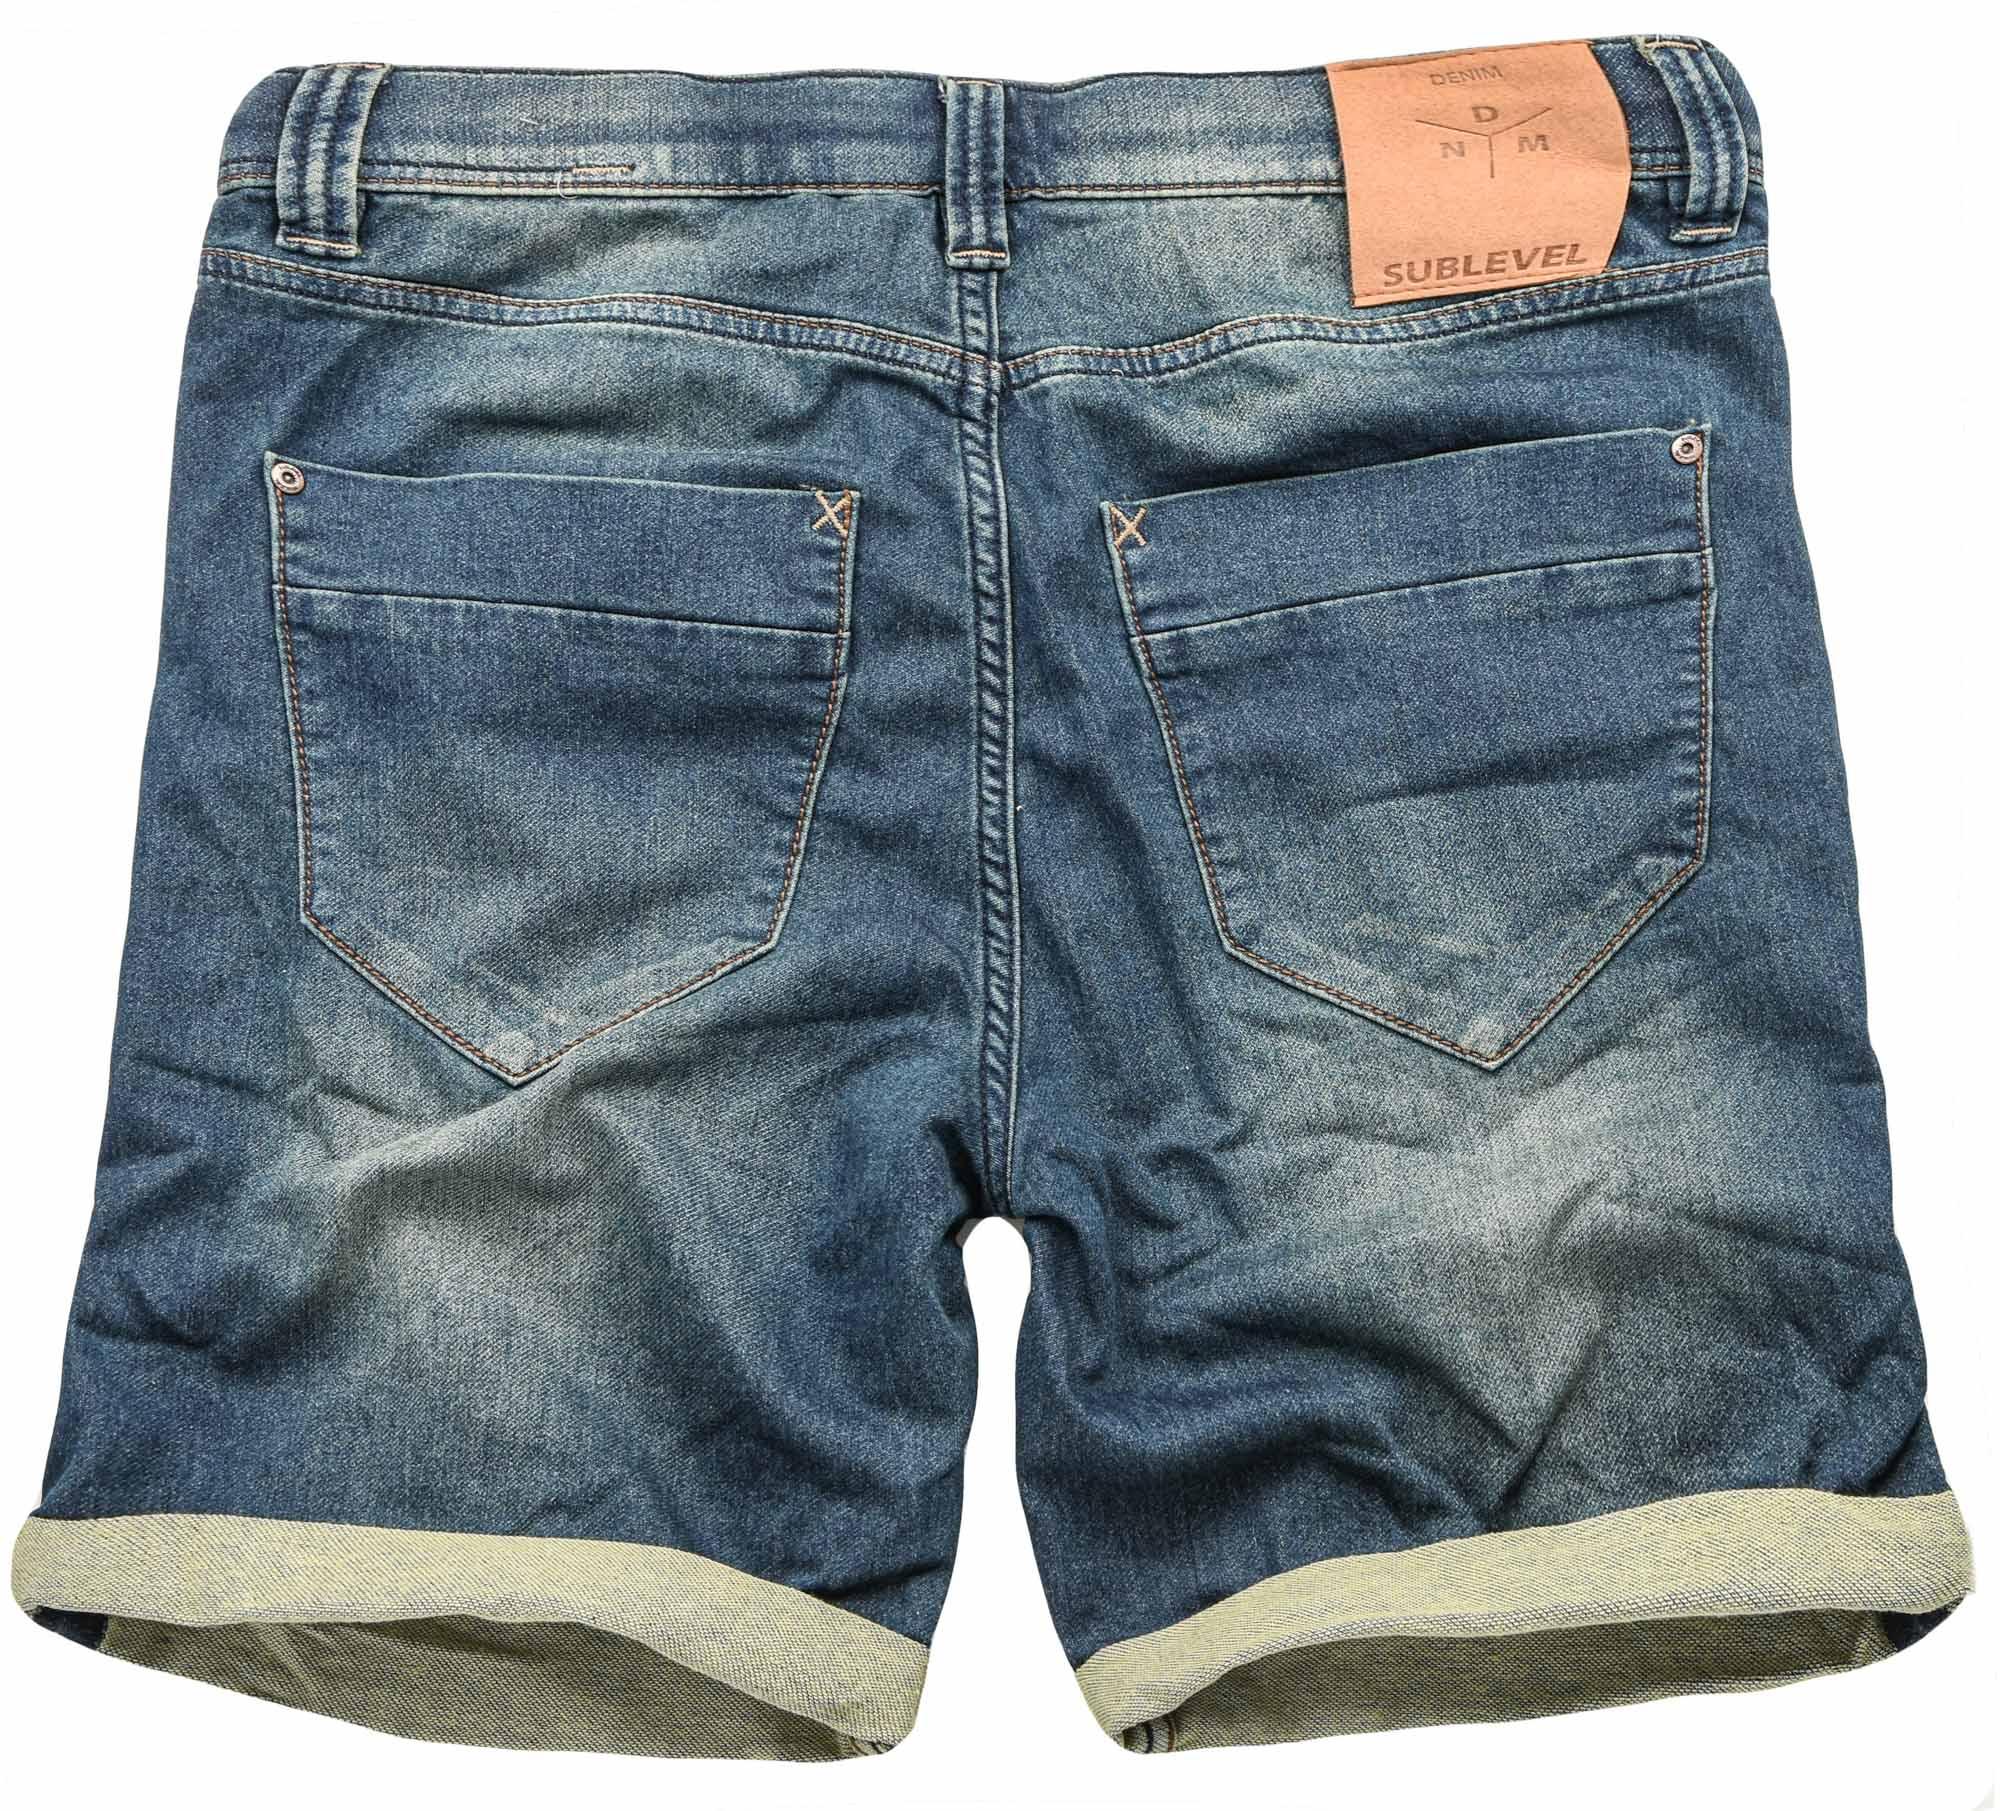 Sublevel-Herren-Sweat-Jeans-Shorts-kurze-Hose-Bermuda-Sommer-Sweathose-Slim-NEU Indexbild 9